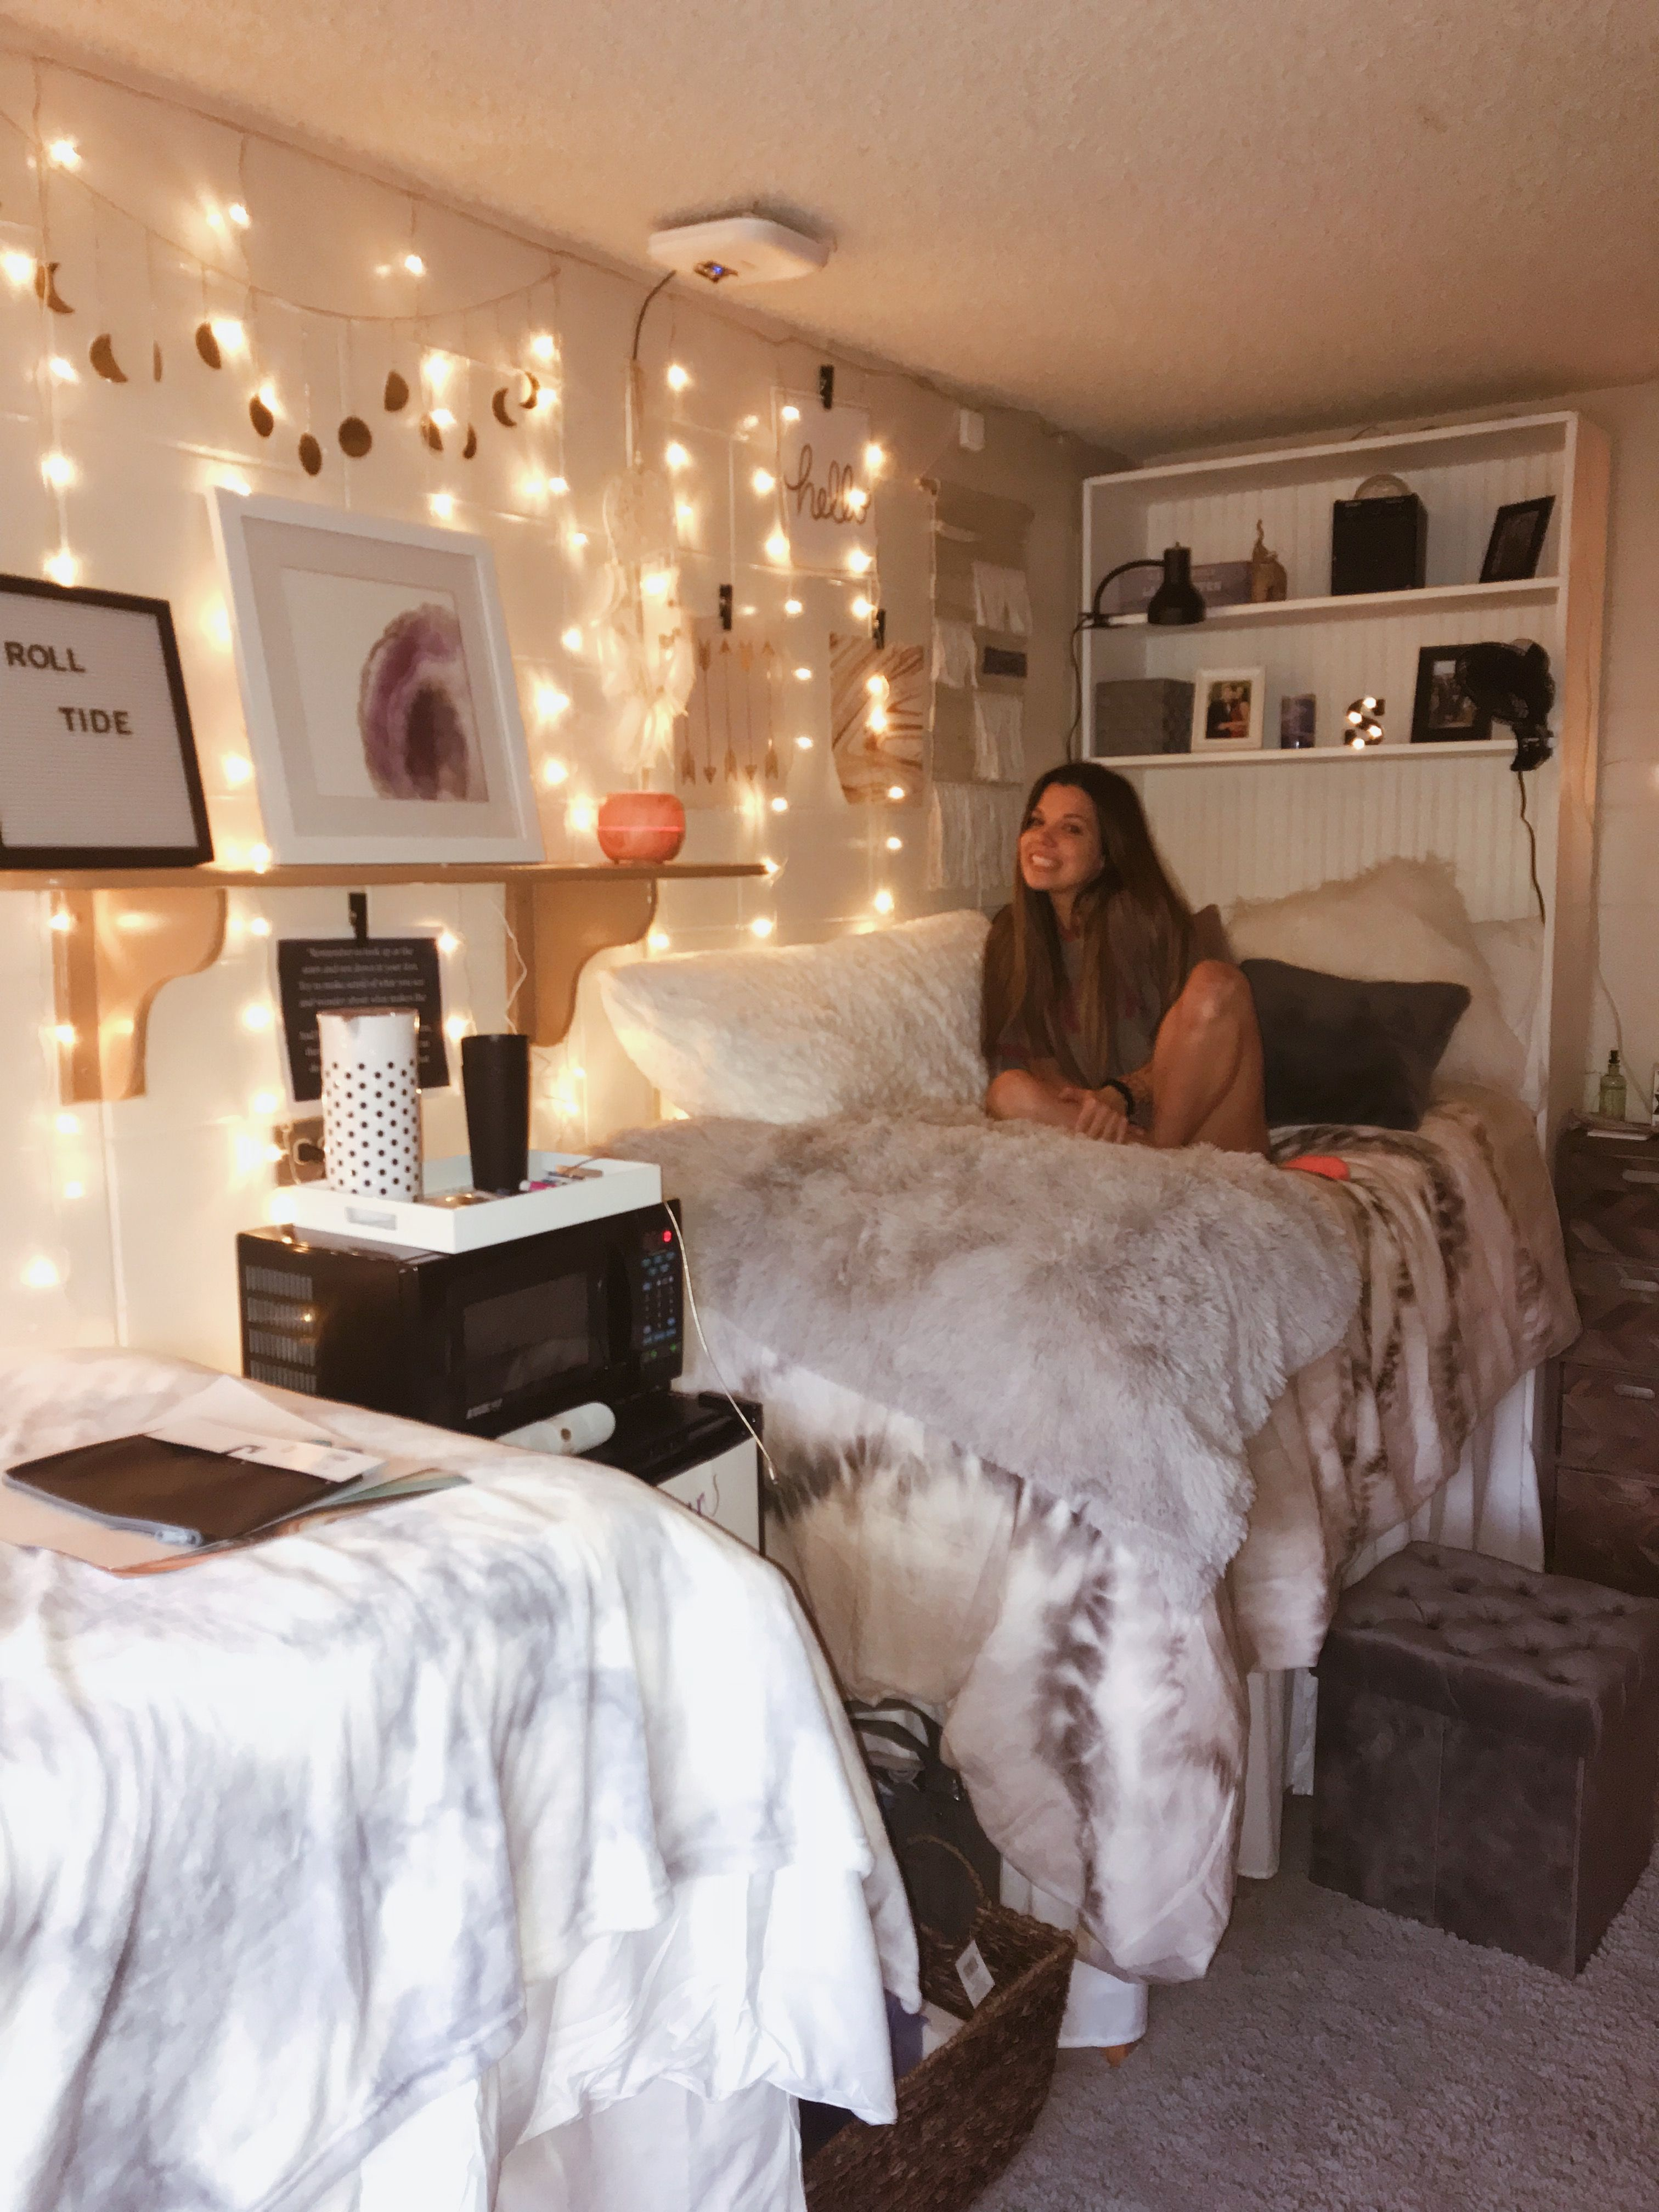 Small Dorm Room Ideas: Pin By Maur Rauch On Room Inspo